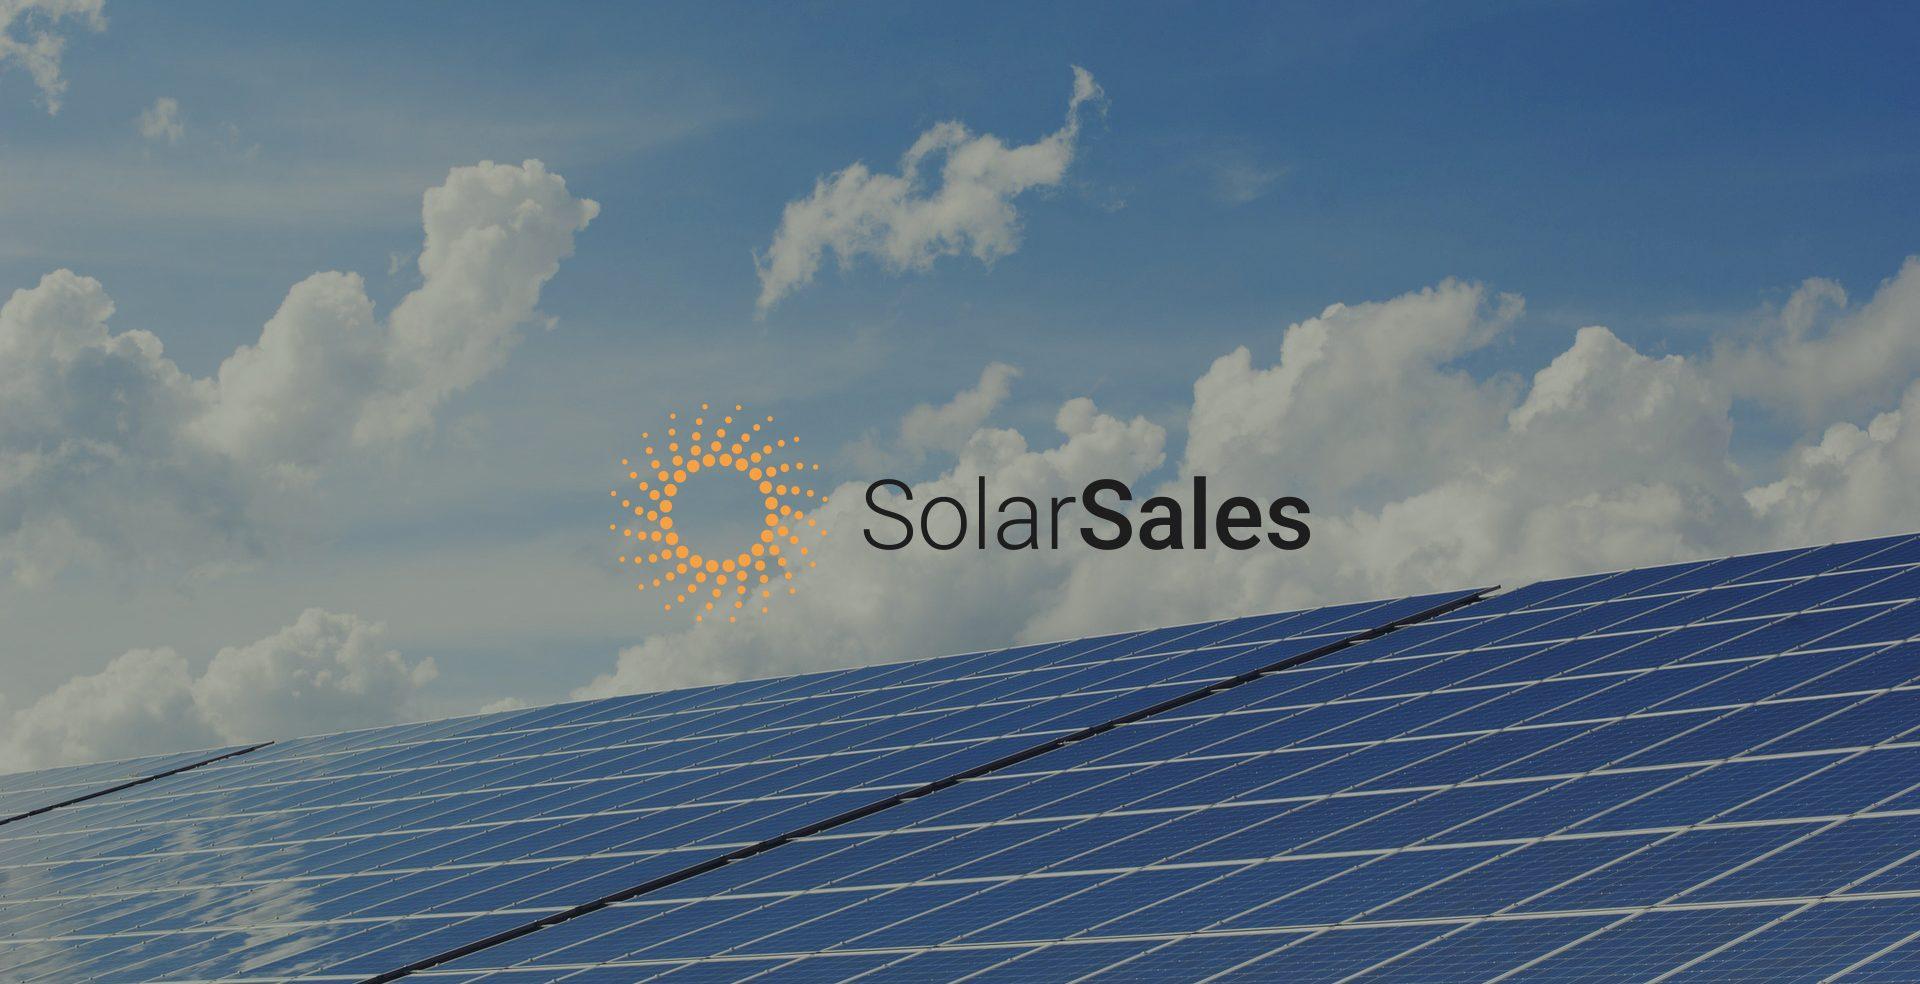 SolarSalesfb